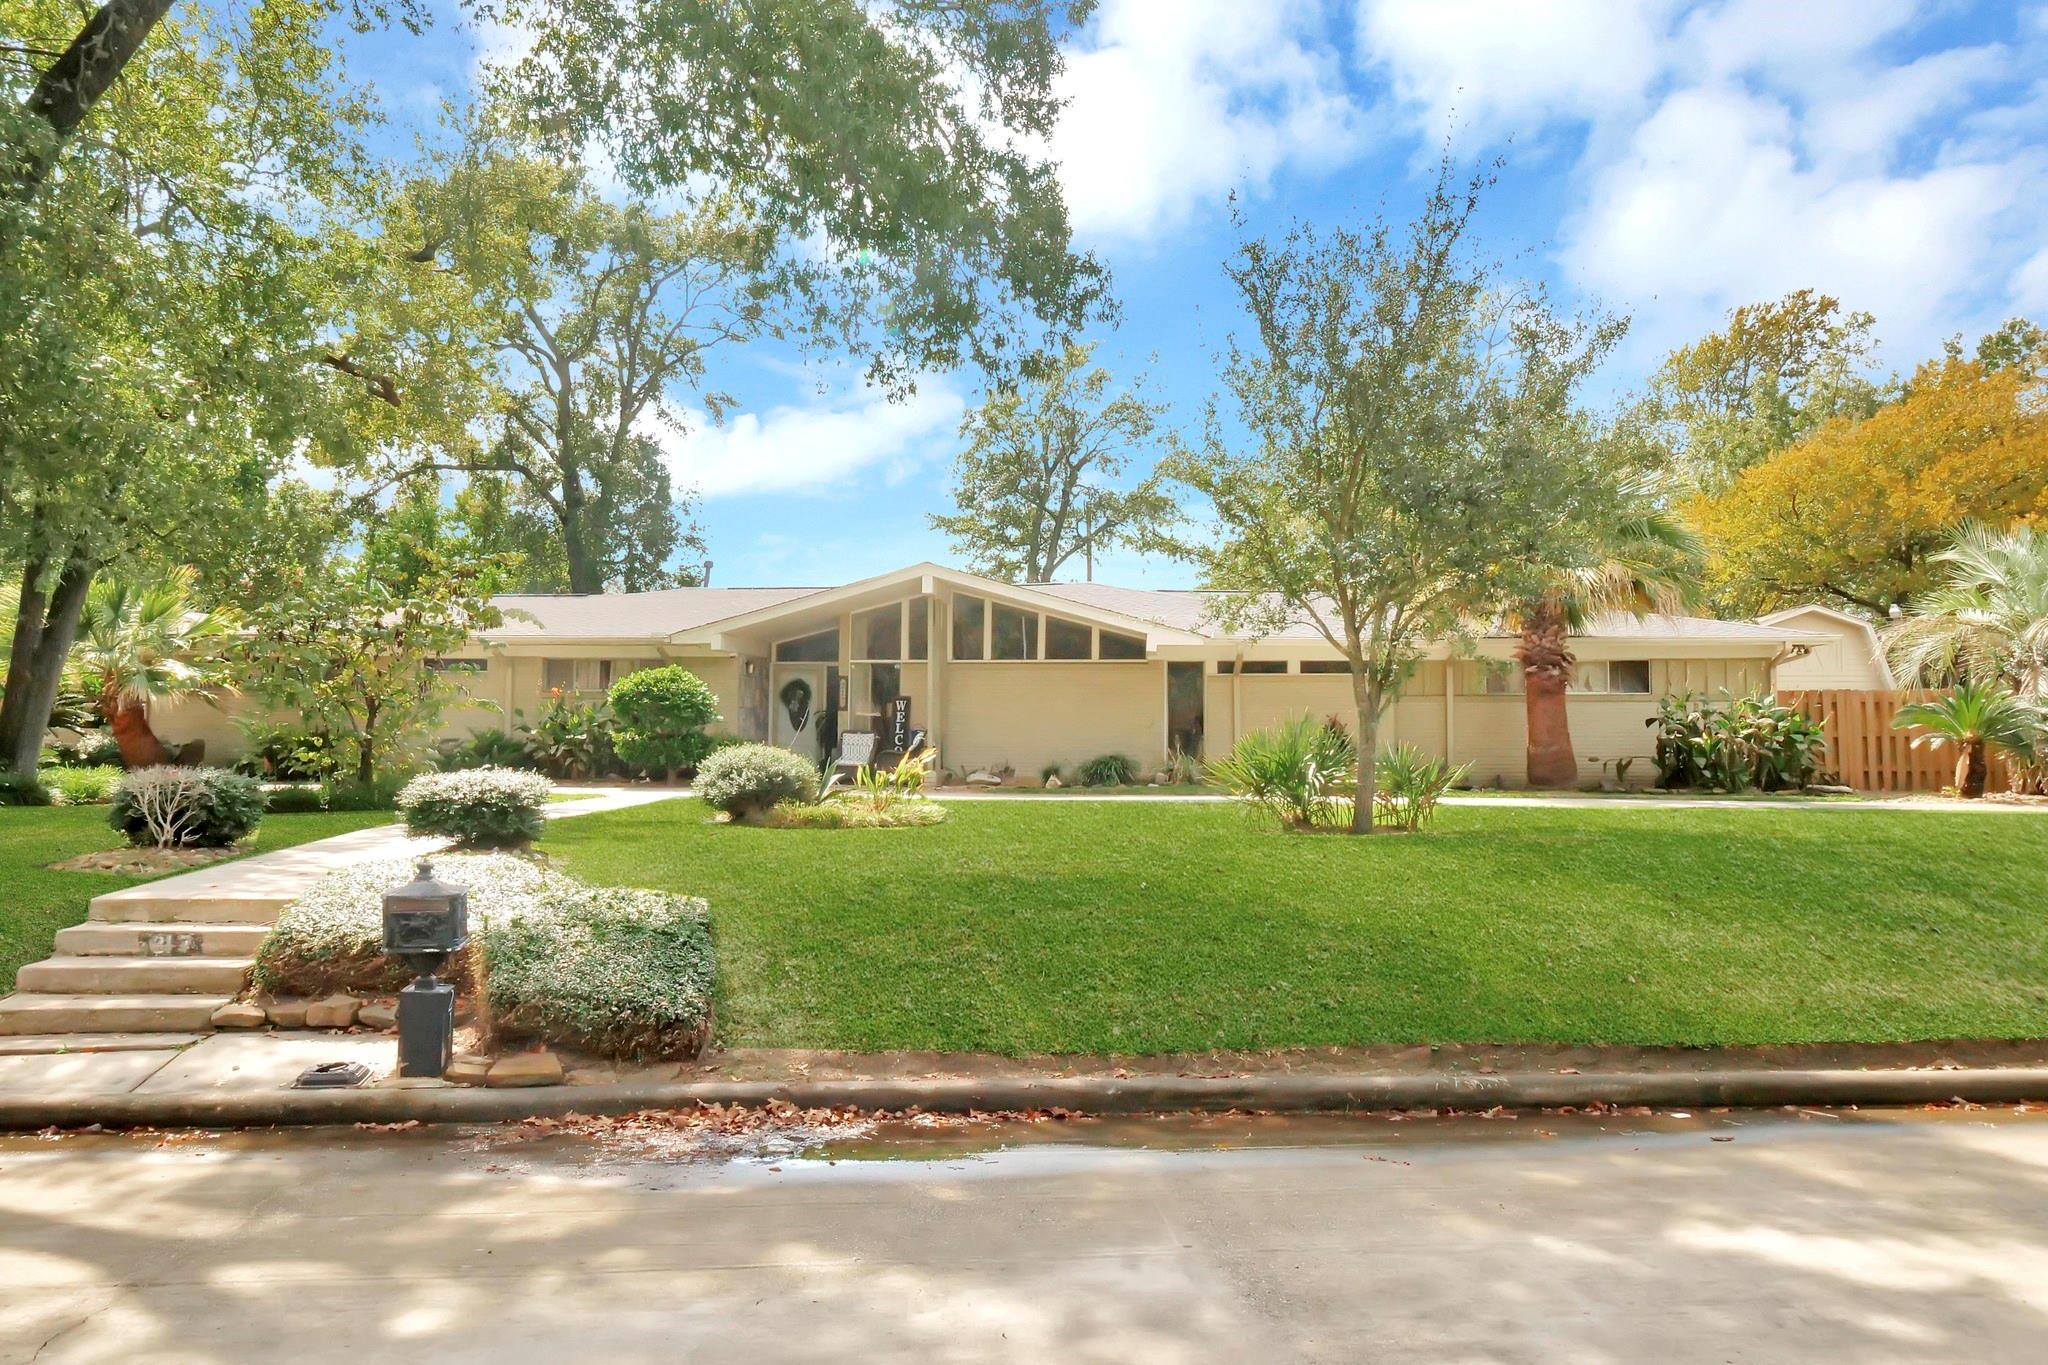 217 Burnett Drive Property Photo - Baytown, TX real estate listing